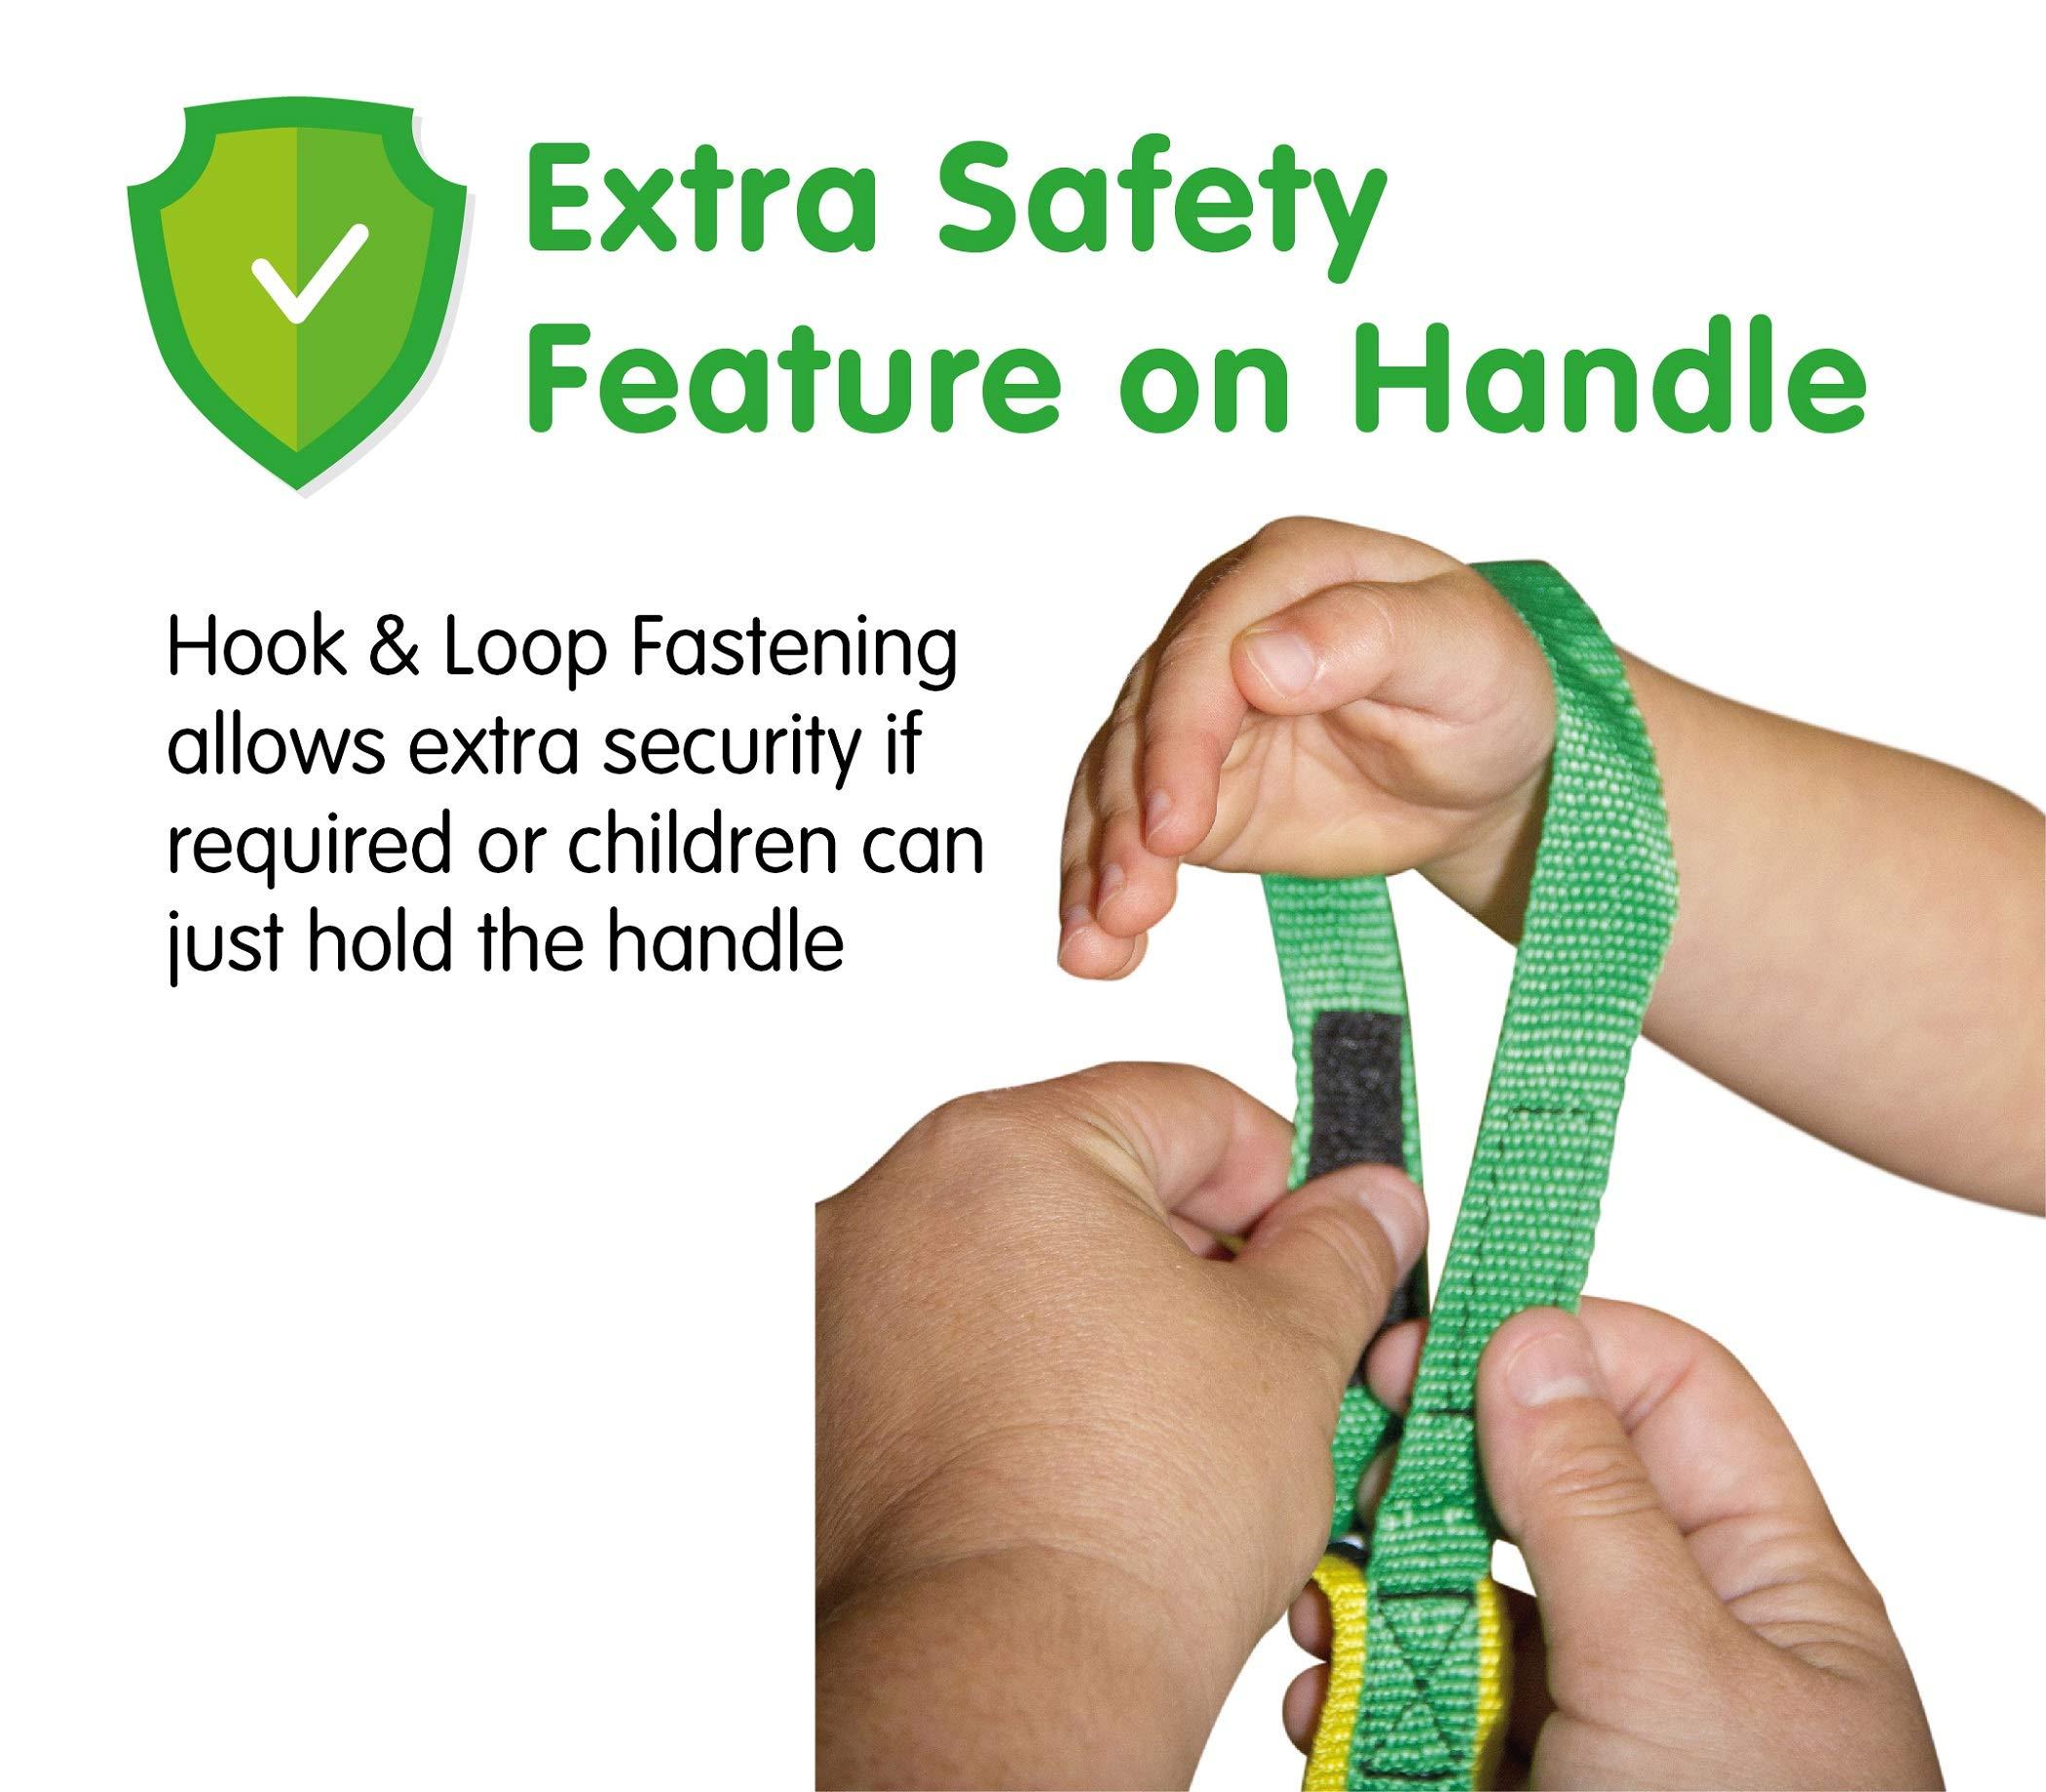 Grab & Go Children's Walking Rope (6 child) with Safe Hi-Viz Details. Teacher Approved Safety Walk In Line Ropes For Preschool Kids. Includes Free Learning Games for Walks Guide.